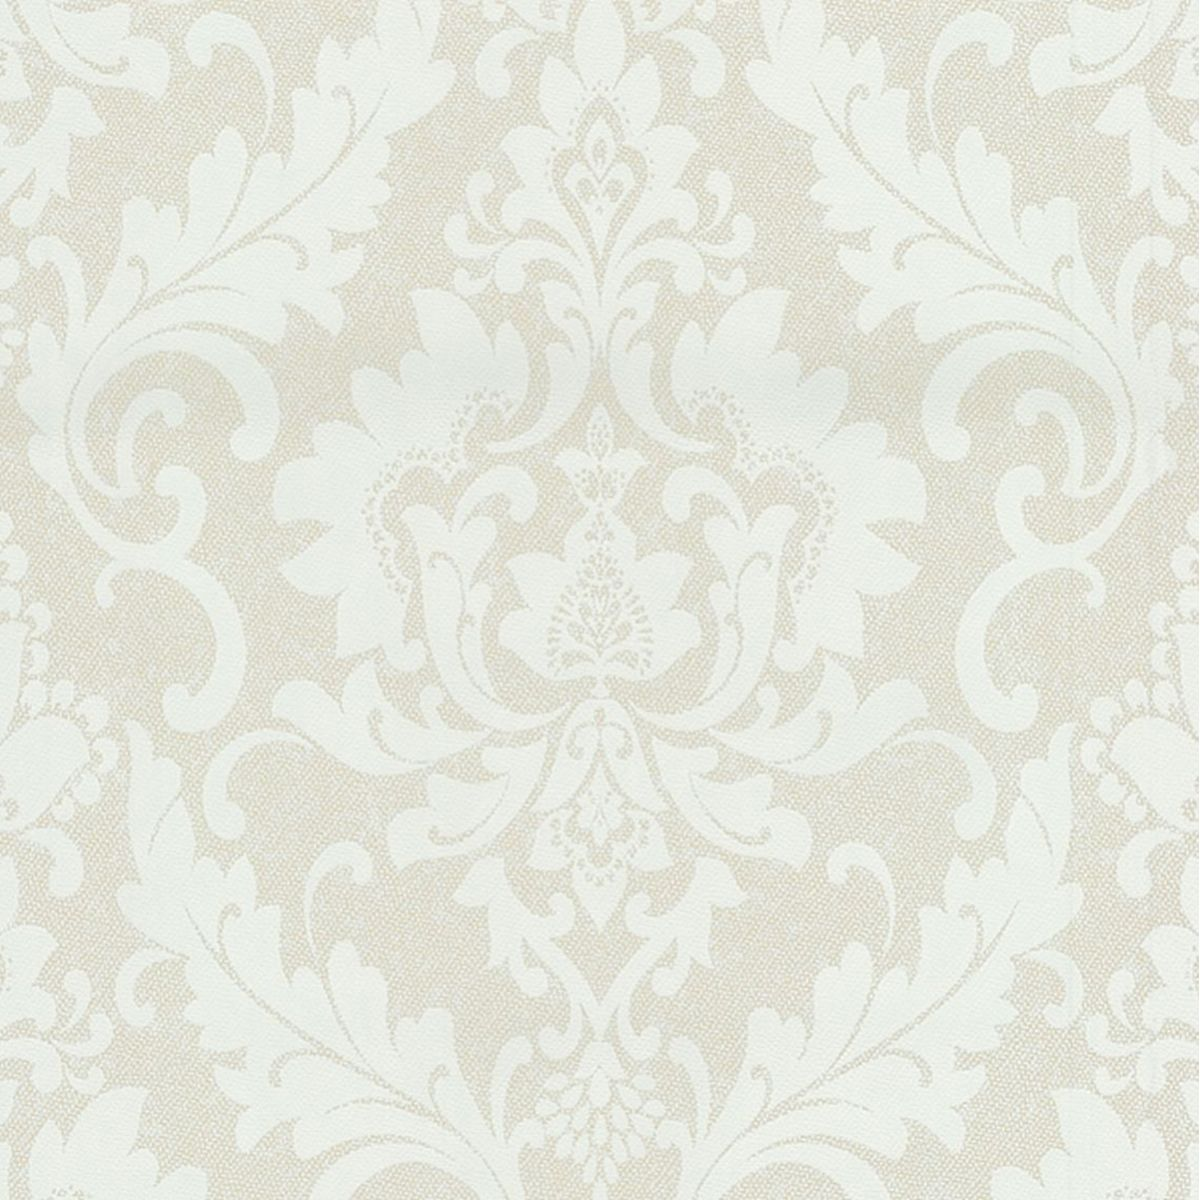 Carta da parati damascata wallpaper vinyl damask nddamas for Carta da parati damascata argento